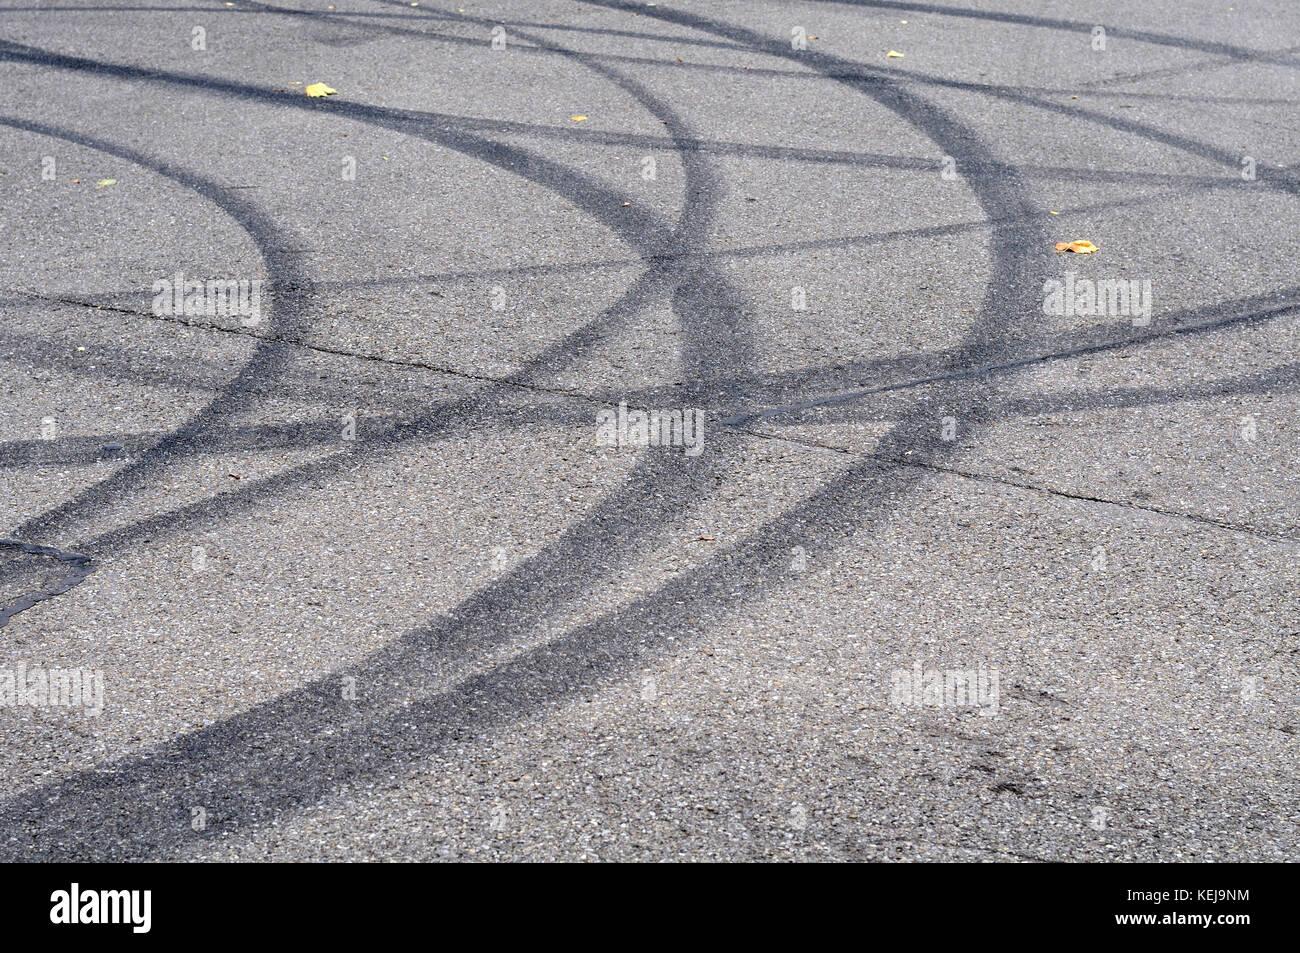 curved skid marks on tarmac stock photo 163901296 alamy